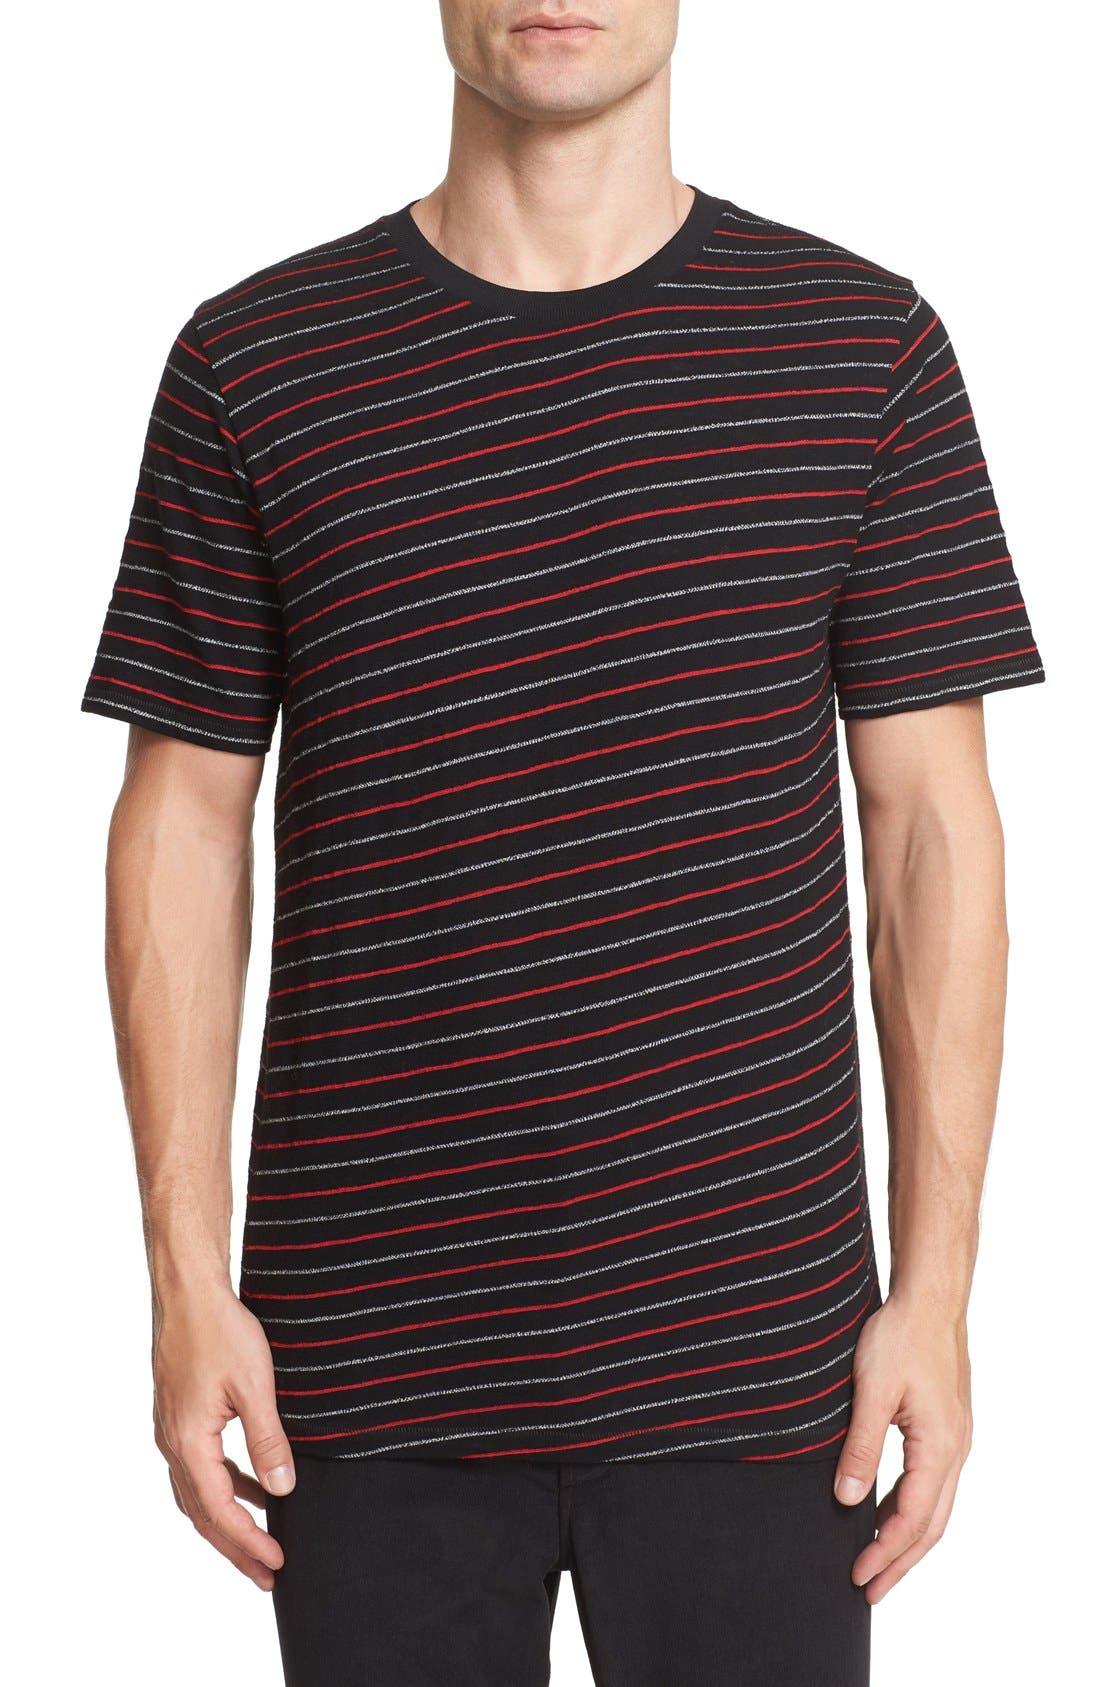 RAG & BONE Colin Stripe T-Shirt